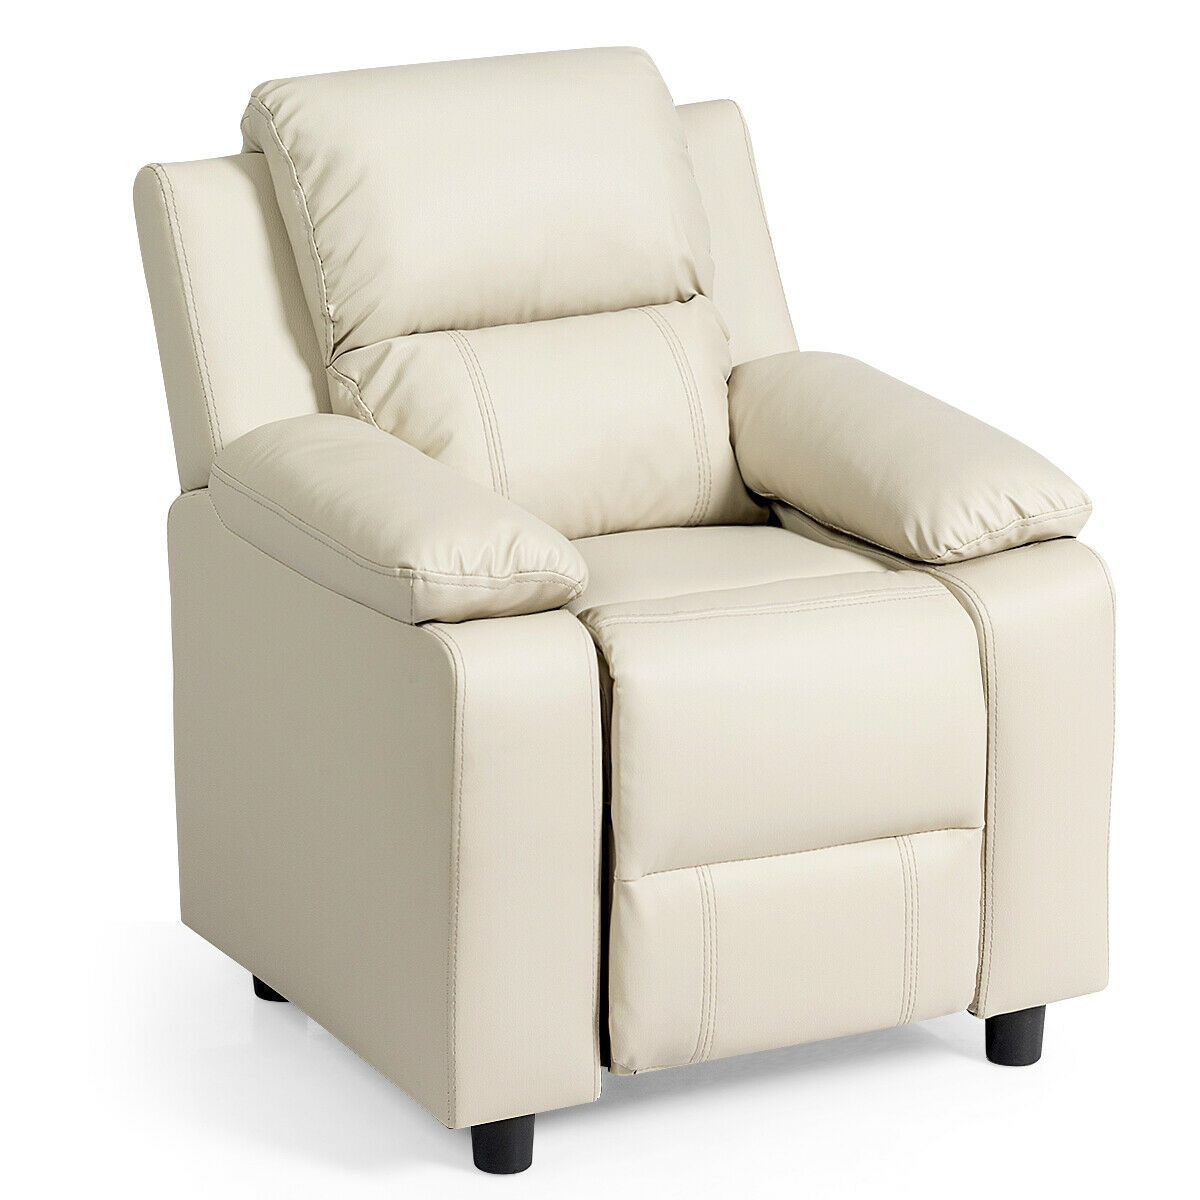 Deluxe Kids Armchair Recliner Headrest Sofa w/ Storage Arms